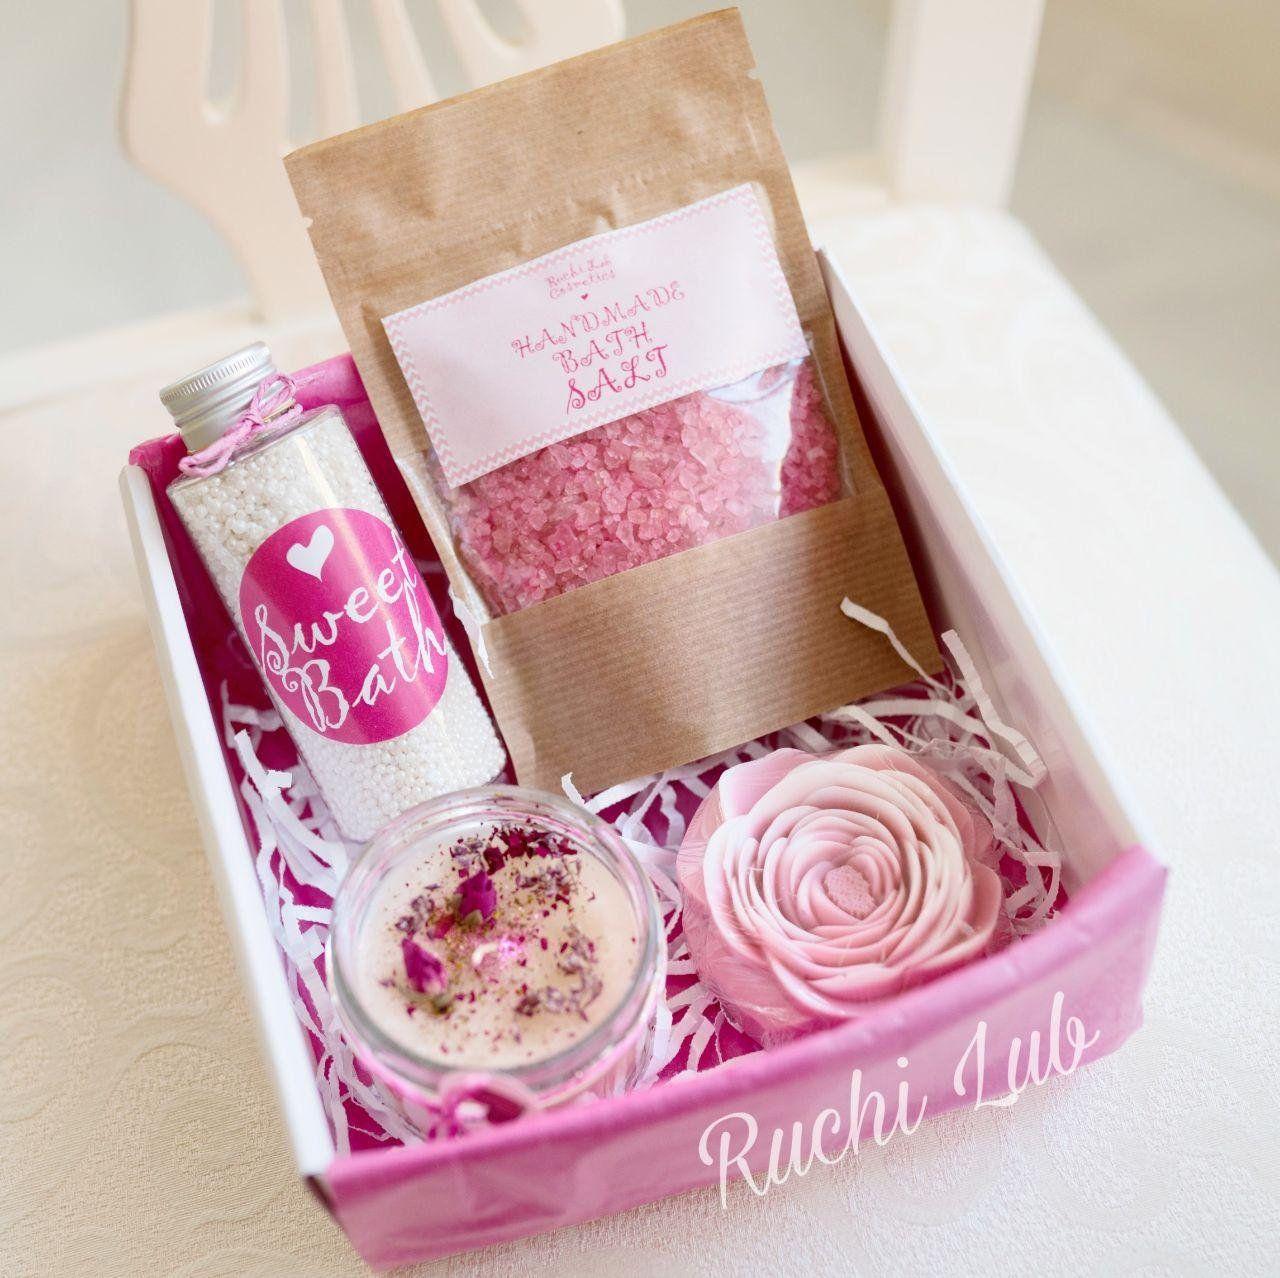 Spa Set Bathroom Set Wedding Gift Home Spa Kit Bath Set Gift